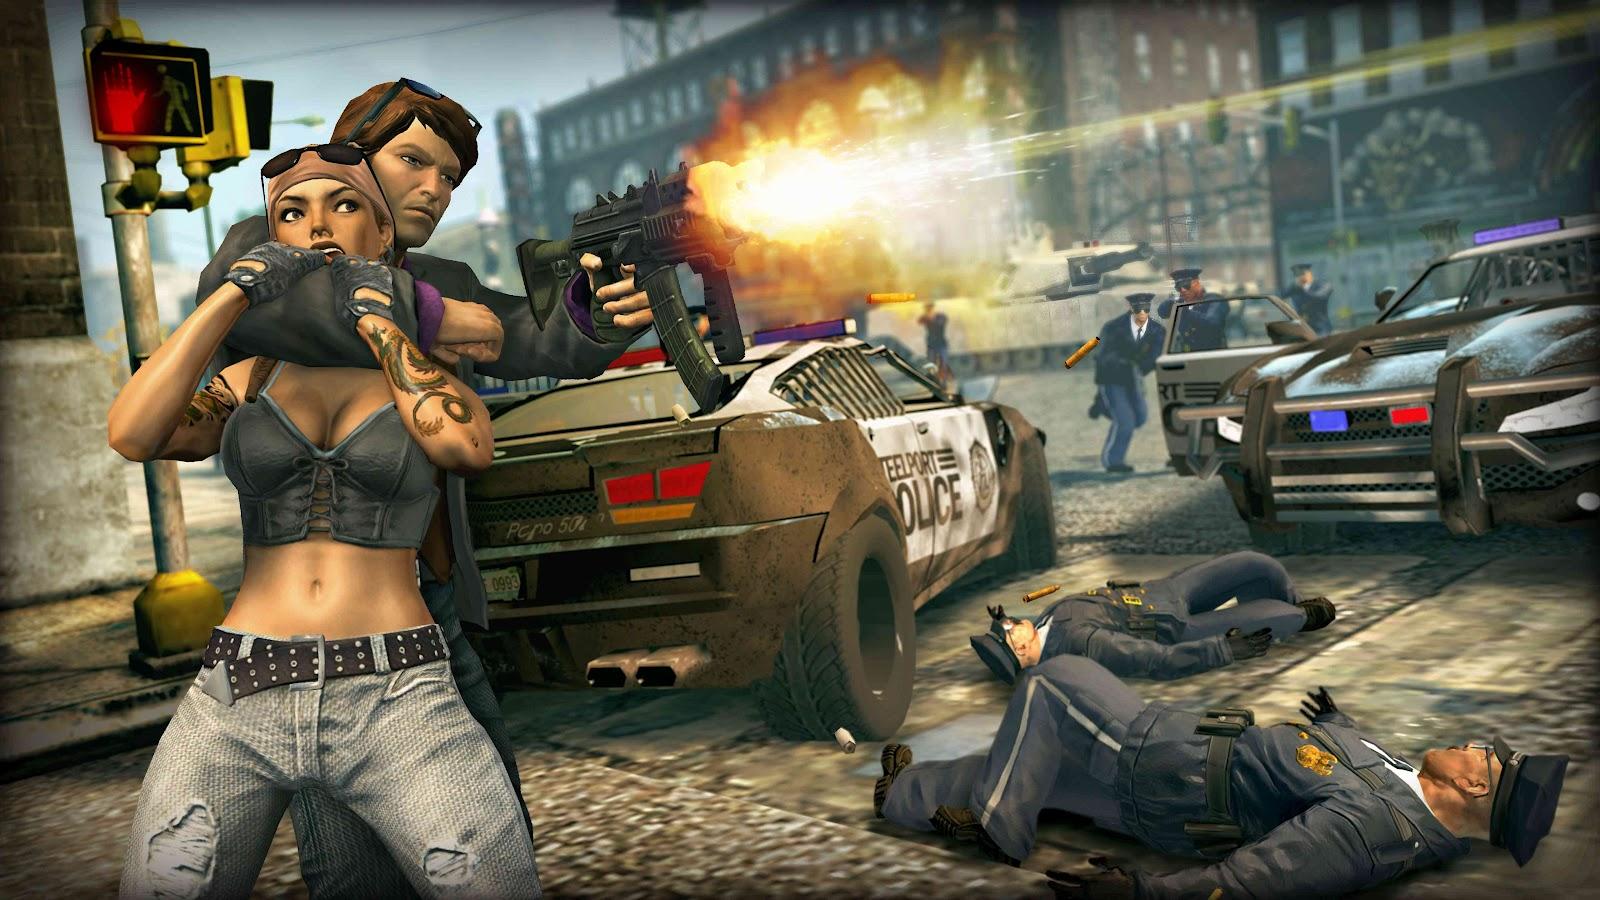 Saints Row 2 Free Full Game Pc